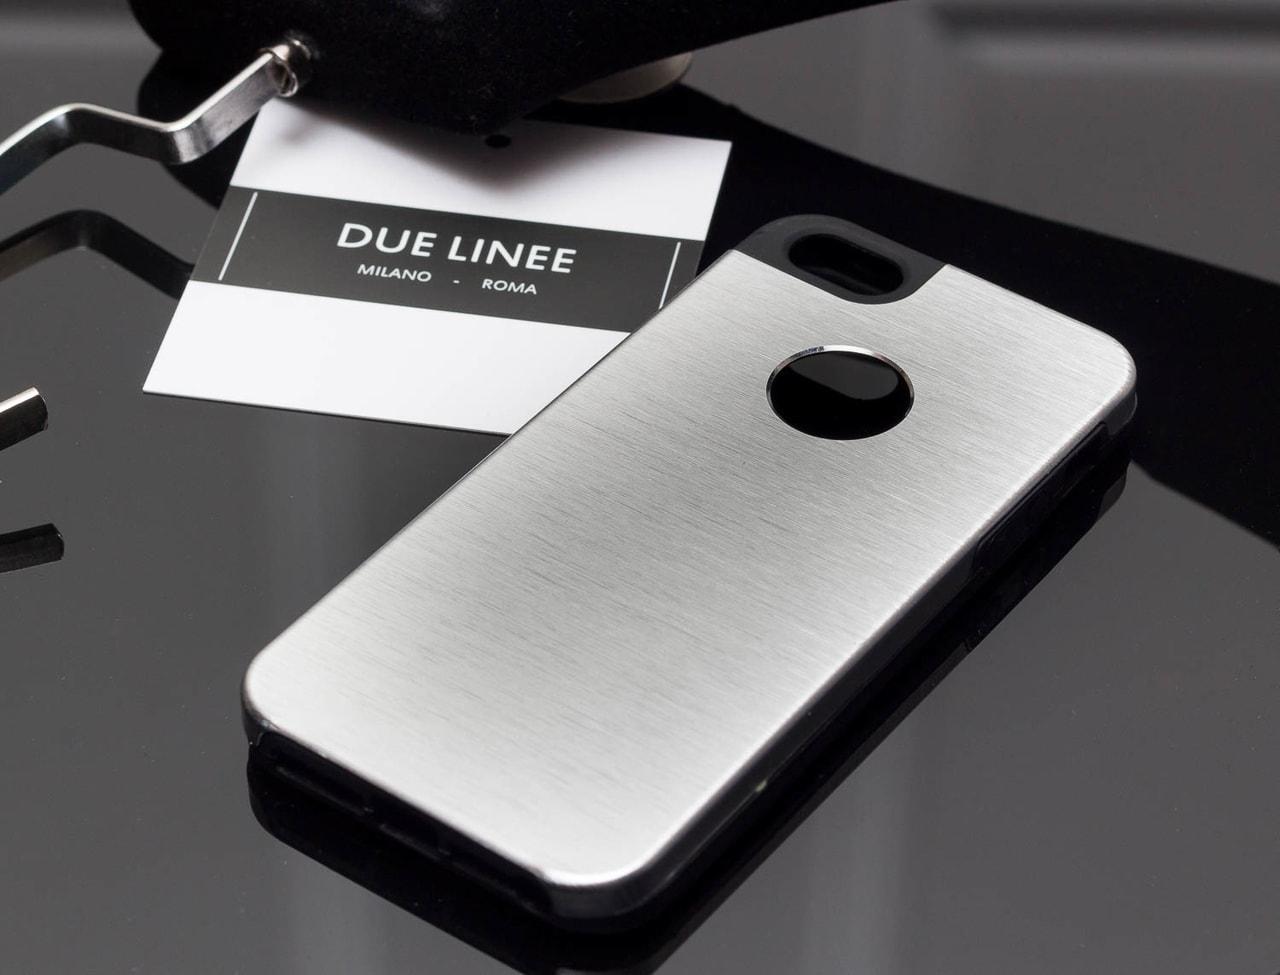 Glamadise.sk - Kryt na Iphone 6   6S - matná strieborná - Due Linee ... 091ef7327ba